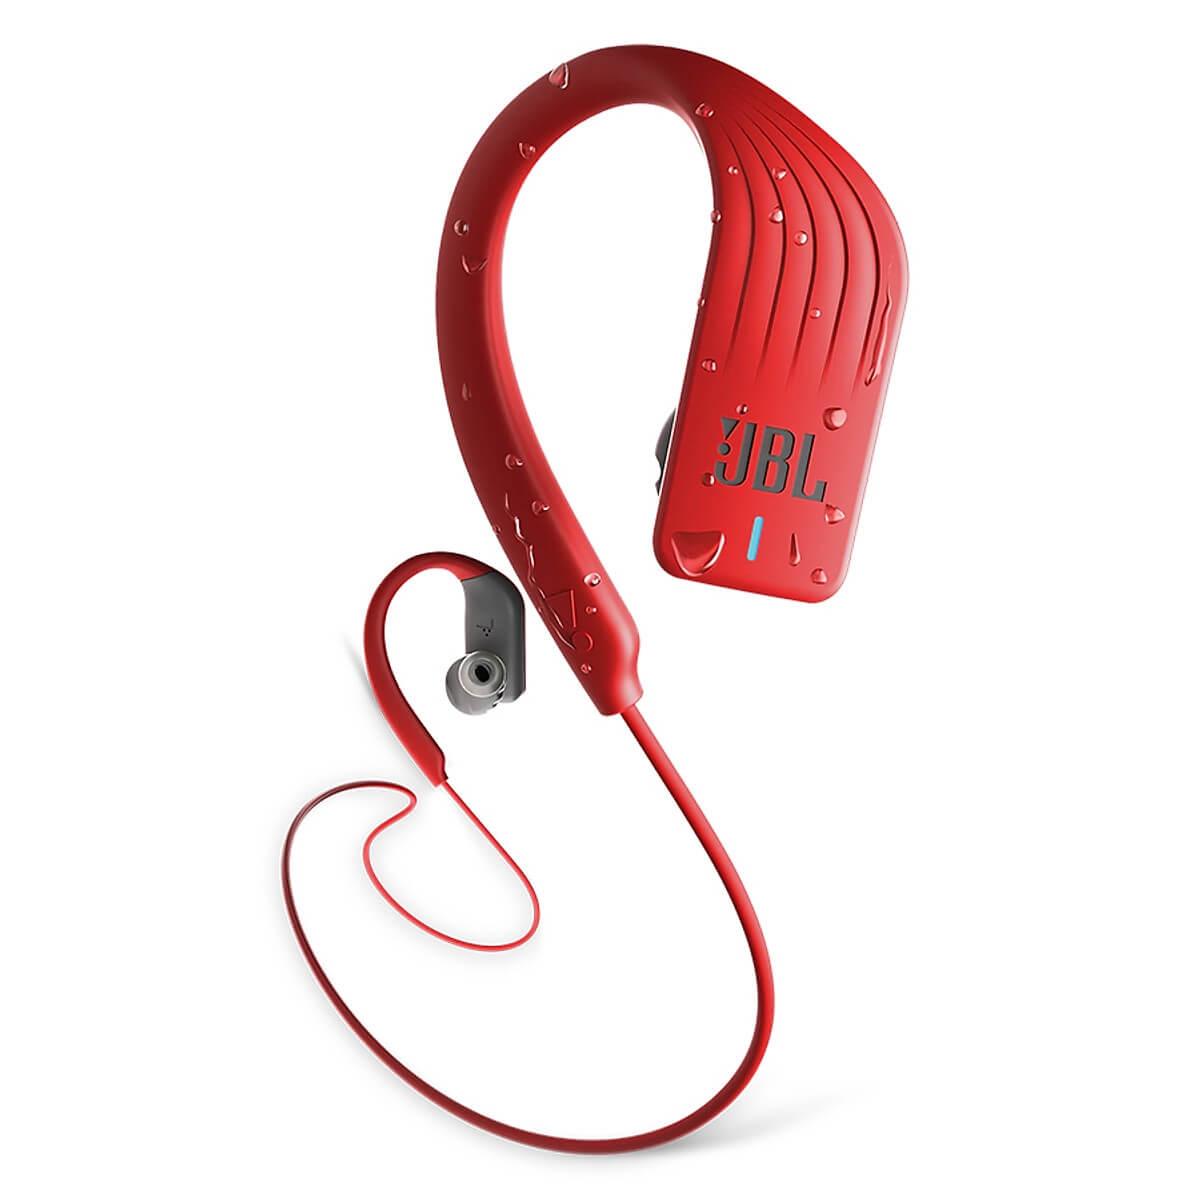 Tai Nghe Bluetooth Thể Thao JBL Endurance Jump